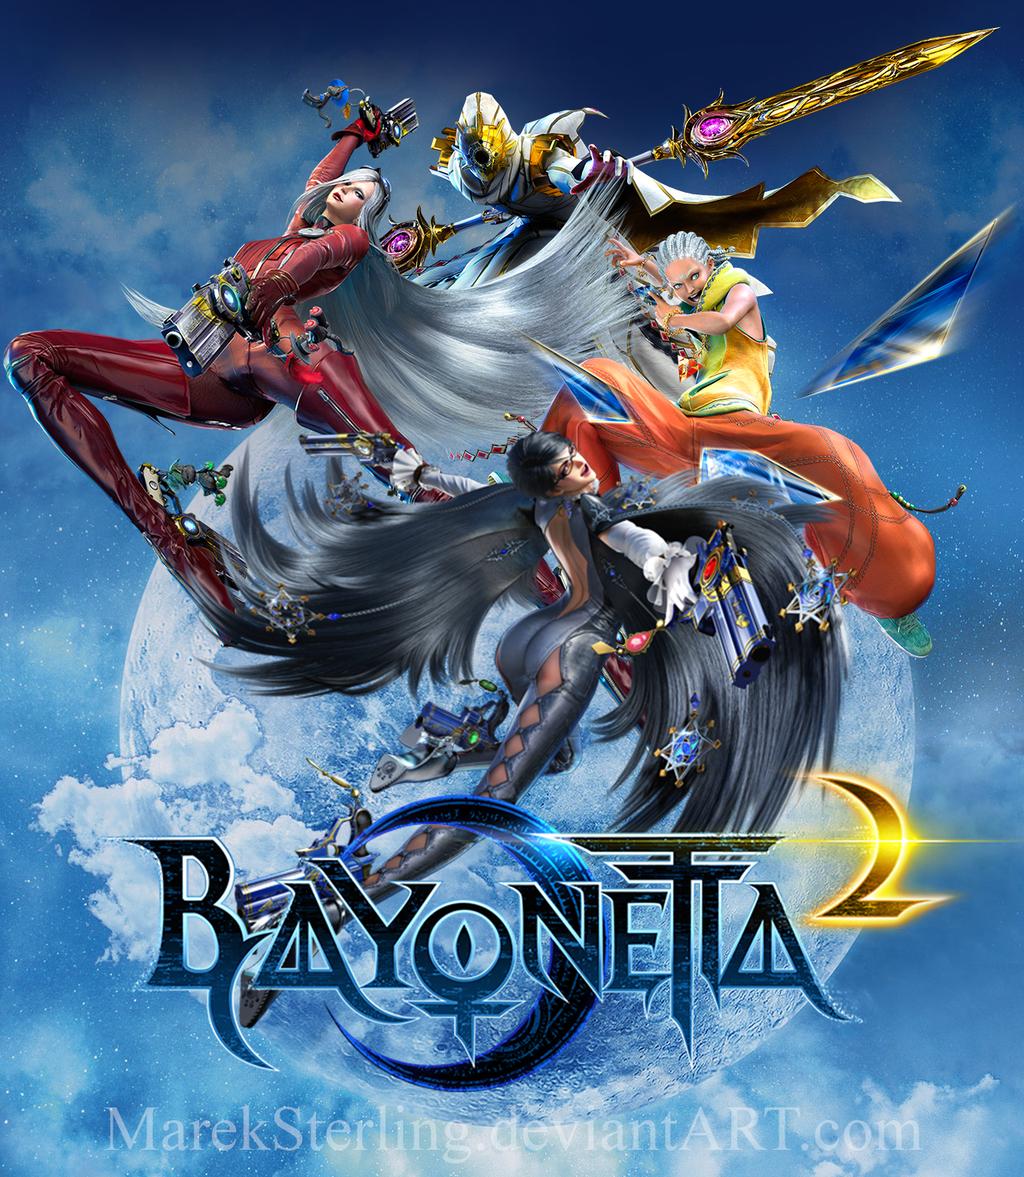 Bayonetta Bloody Fate บาโยเน็ตต้า บลัดดี้เฟท [HD][พากย์ไทย]